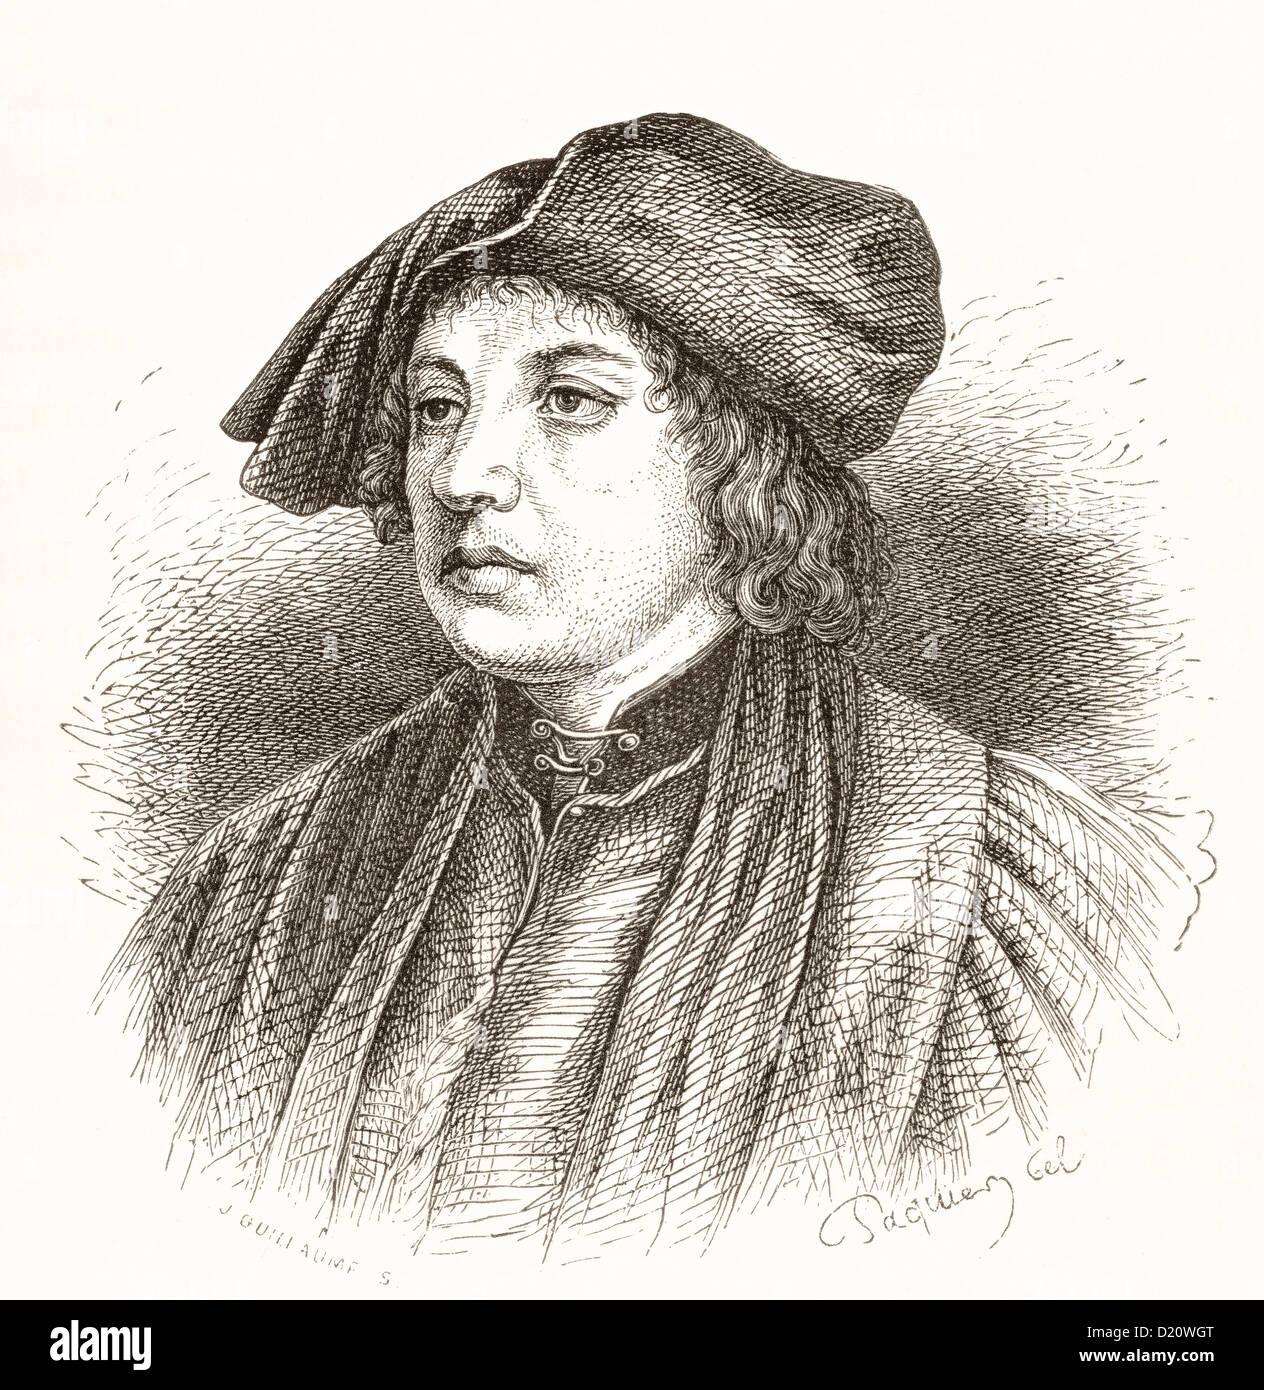 Martin Schongauer,  c.1448-1491. German engraver, artist and printmaker. - Stock Image